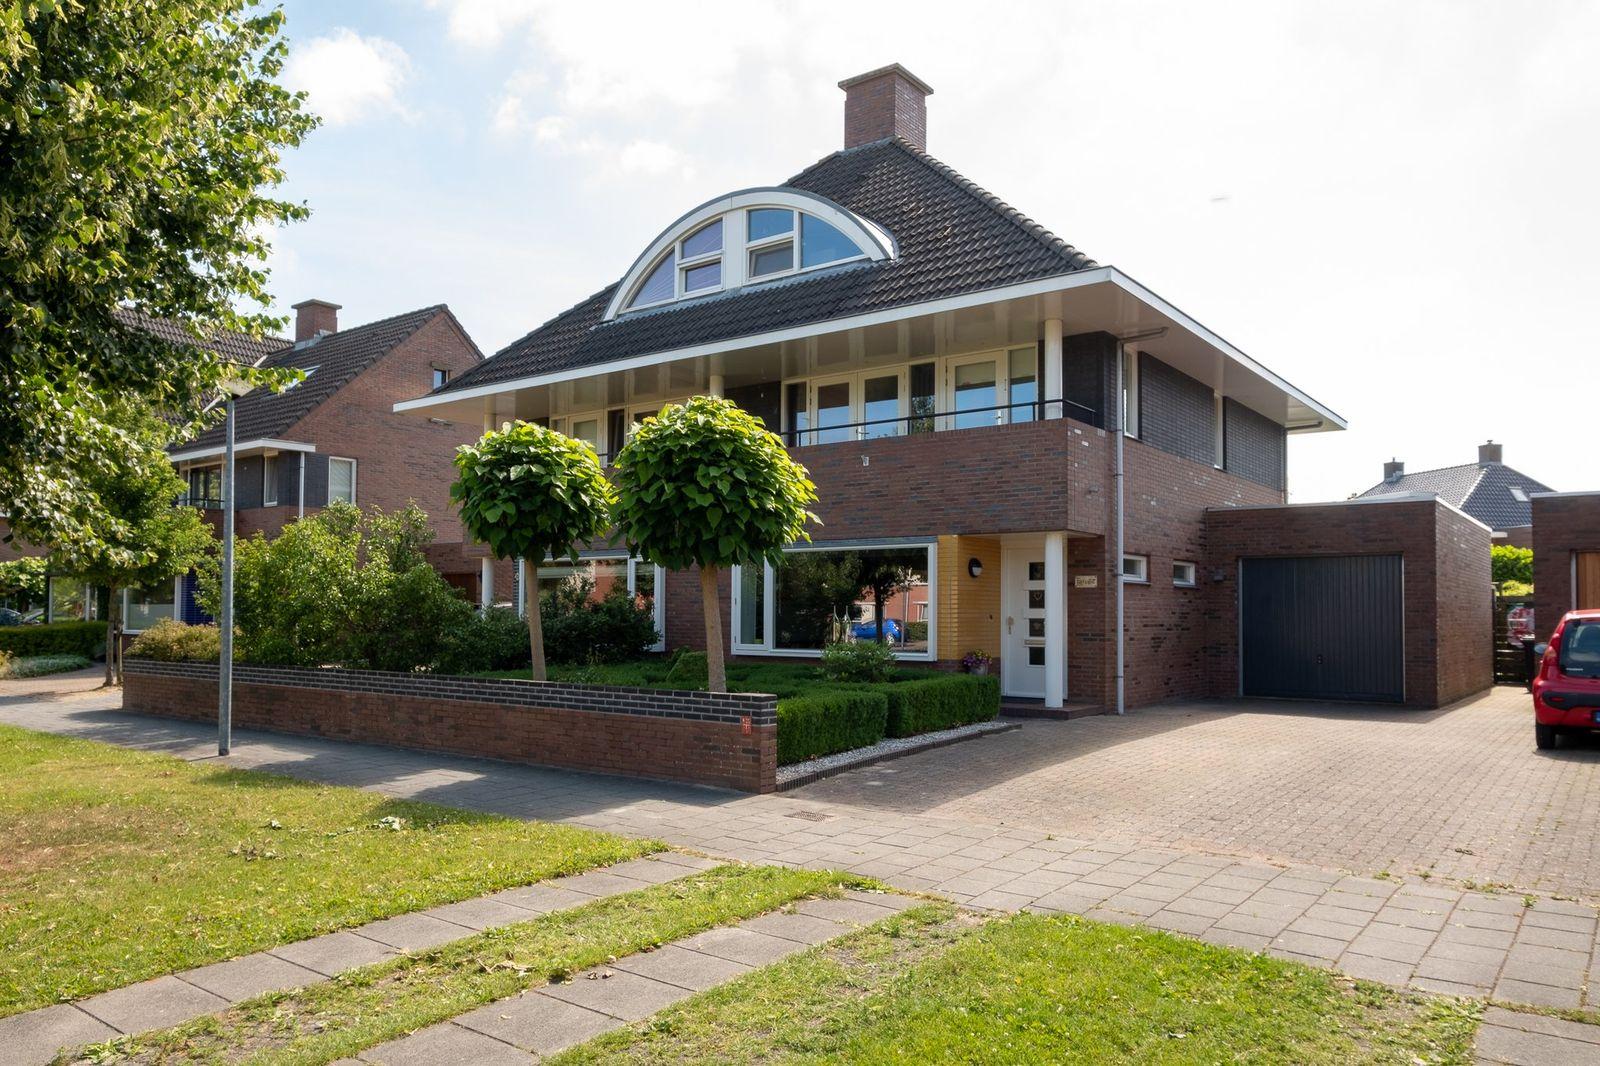 Caro van Eyckweg 27, Assen